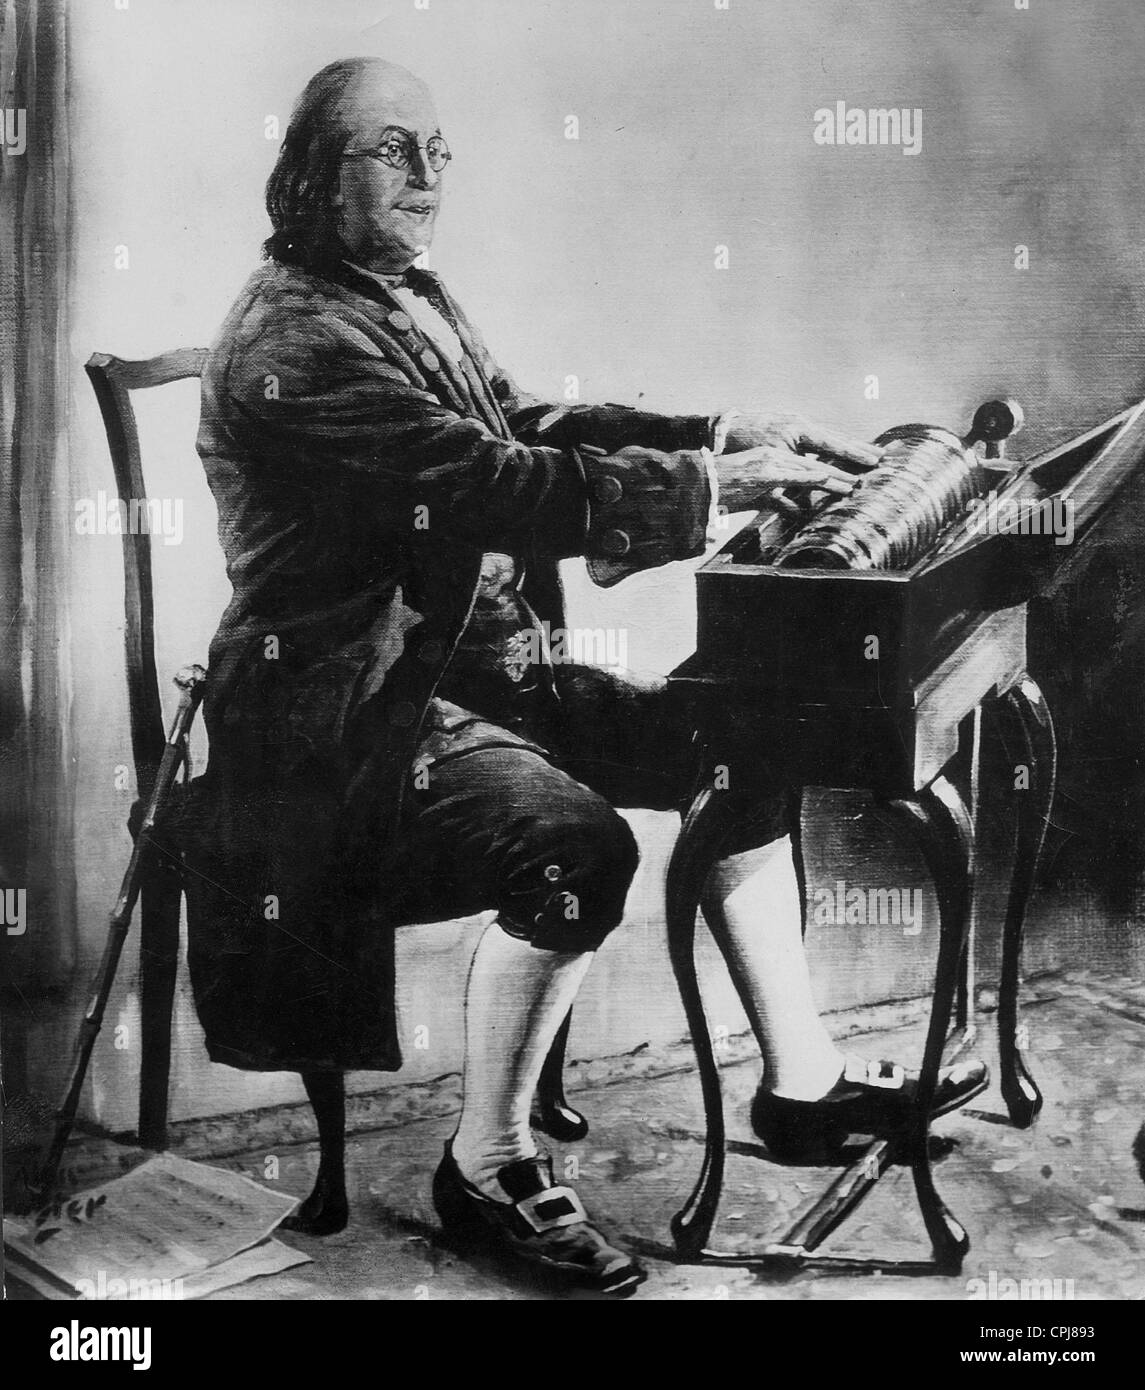 Benjamin Franklin With A Glass Harmonica Stock Photo